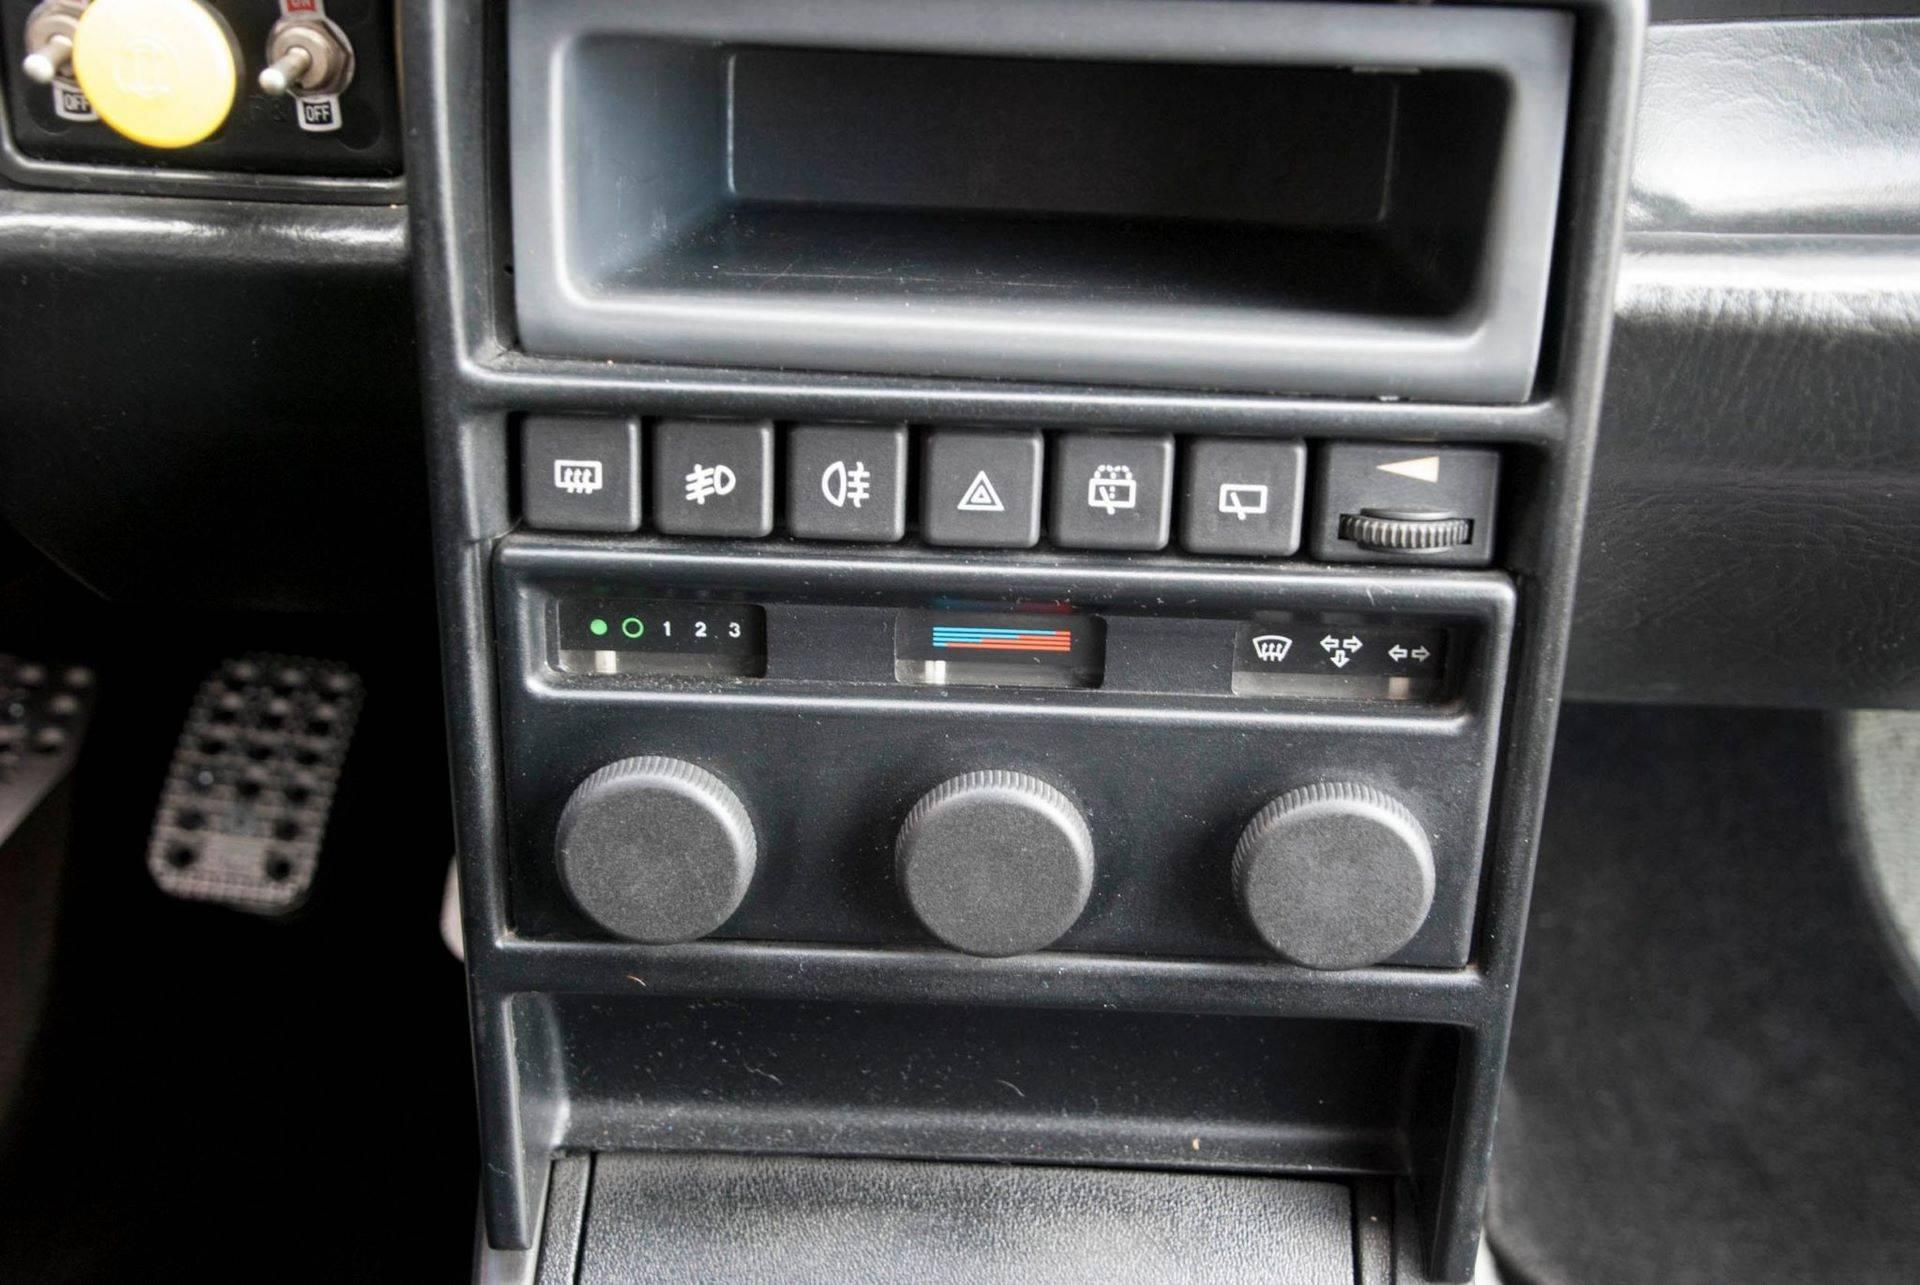 Lancia-Delta-Integrale-8V-1989-65